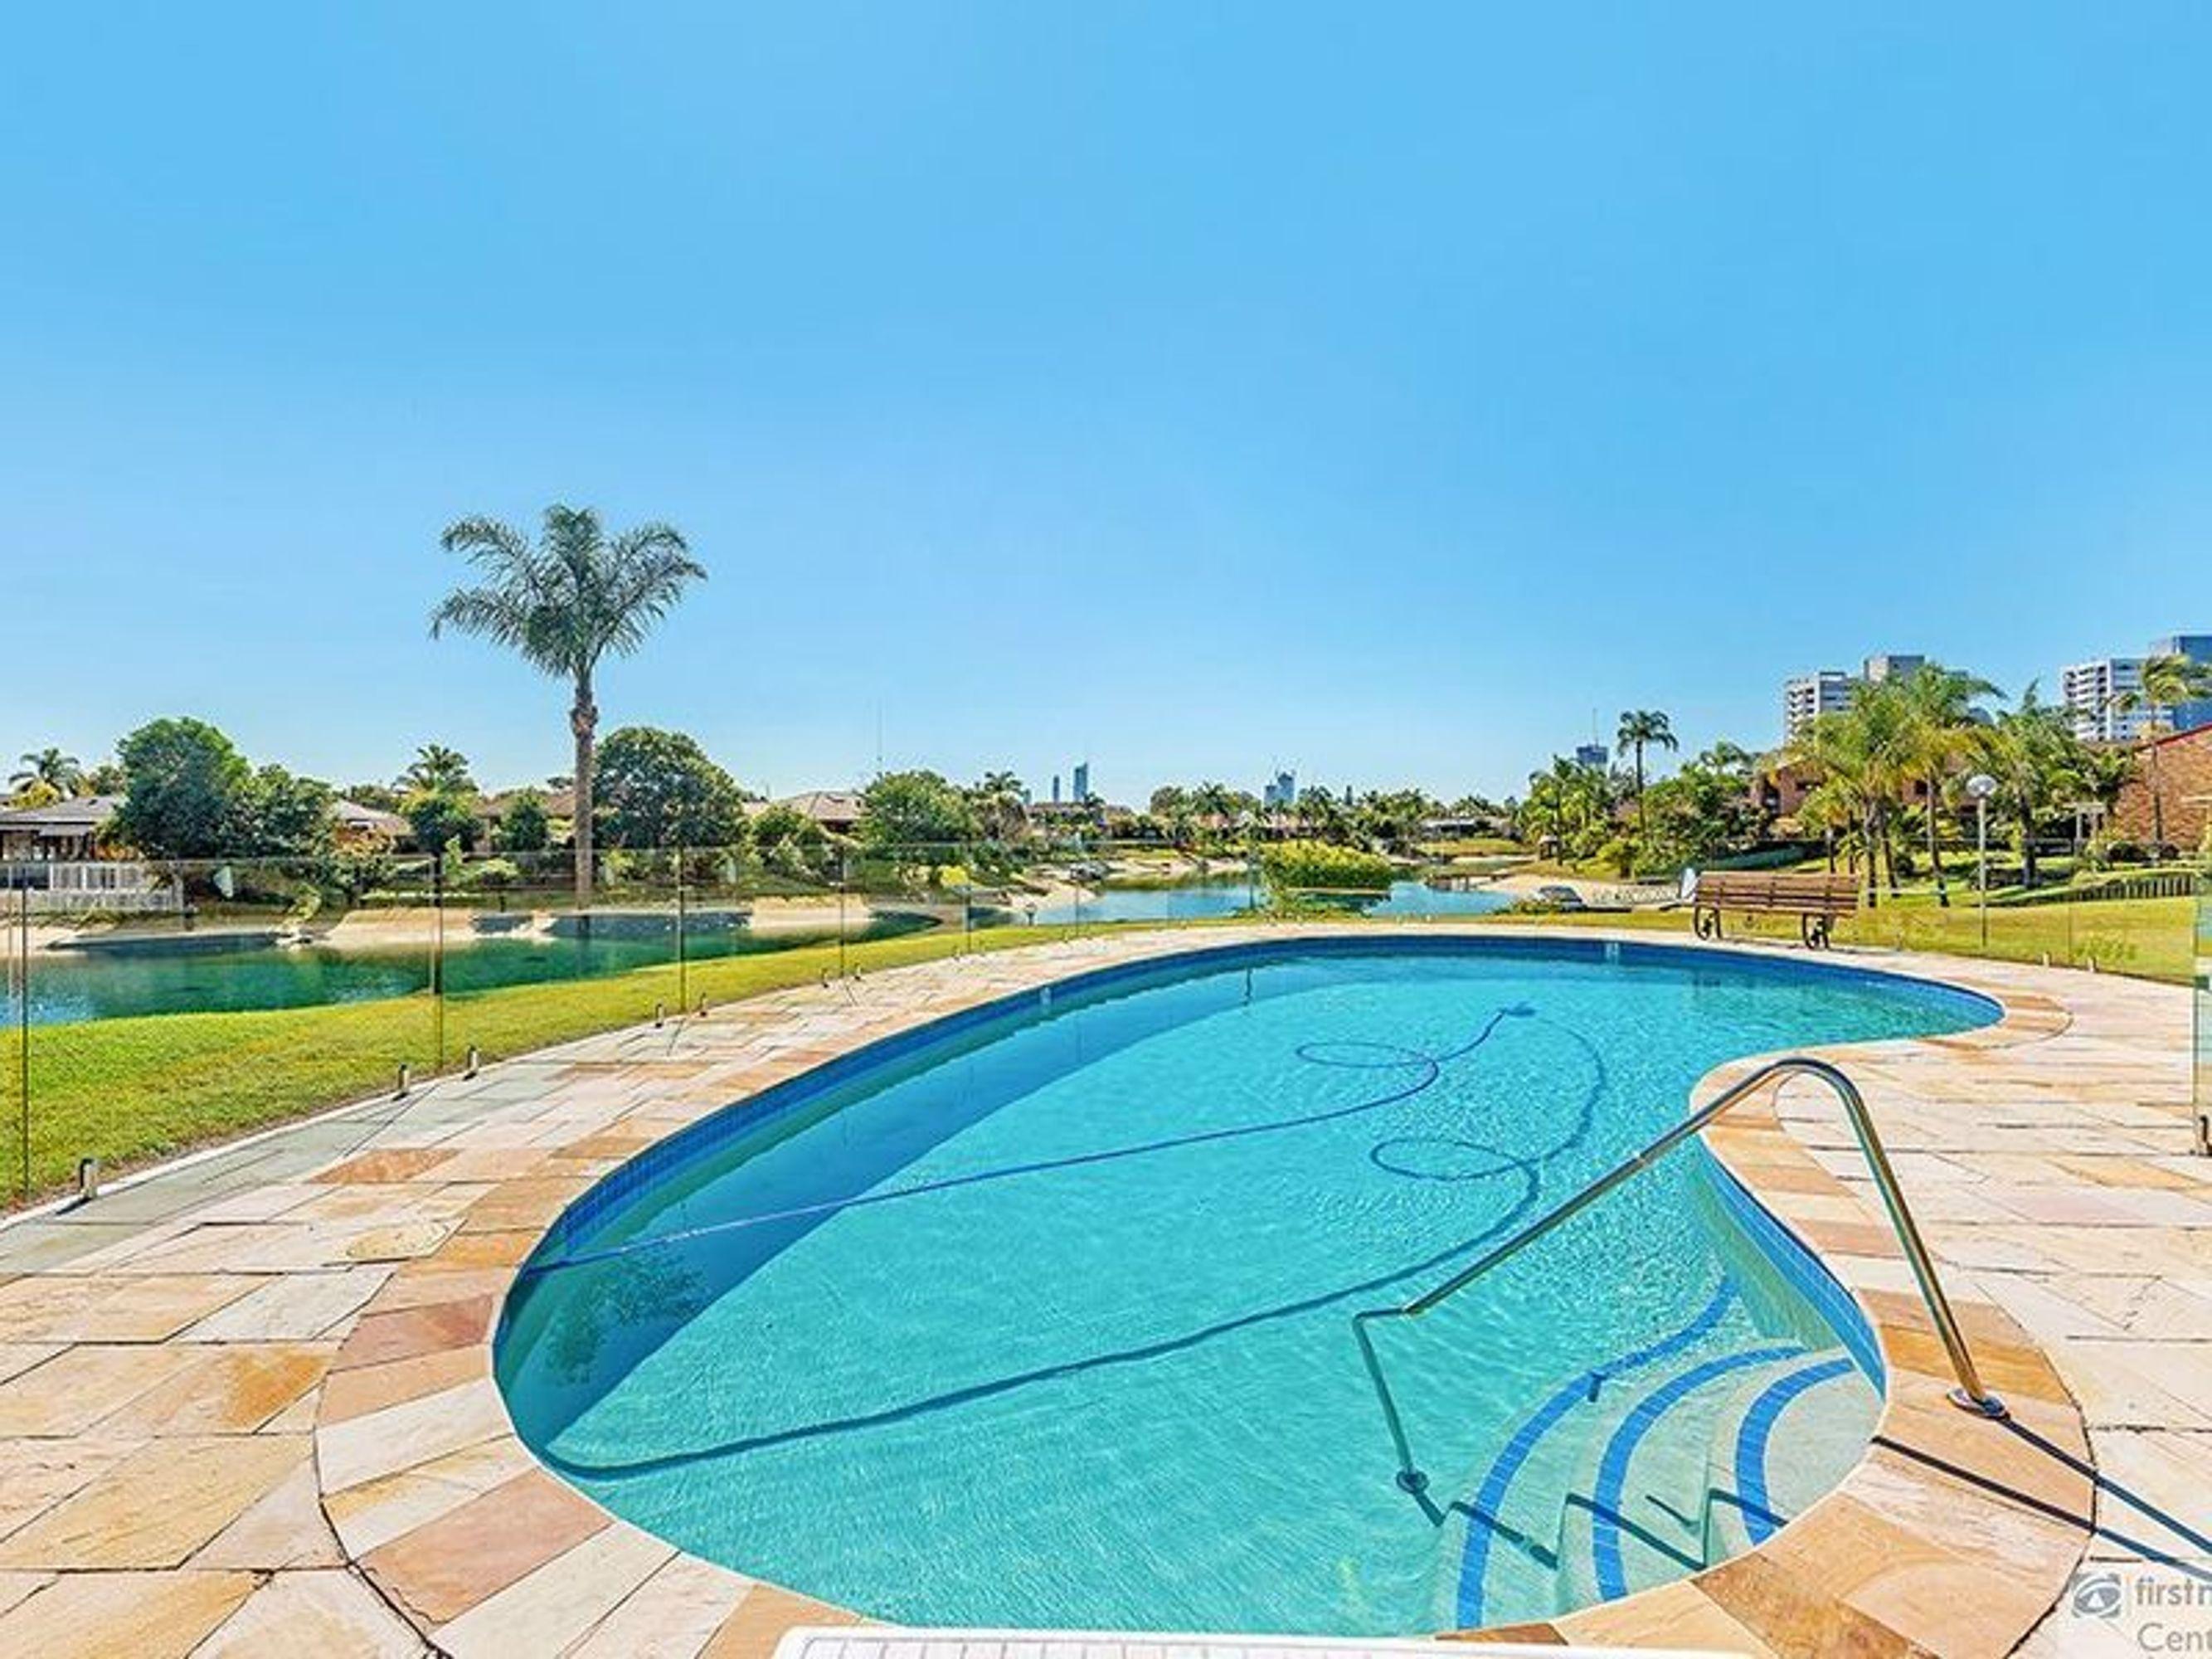 7/14 Dunlop Court, Mermaid Waters, QLD 4218